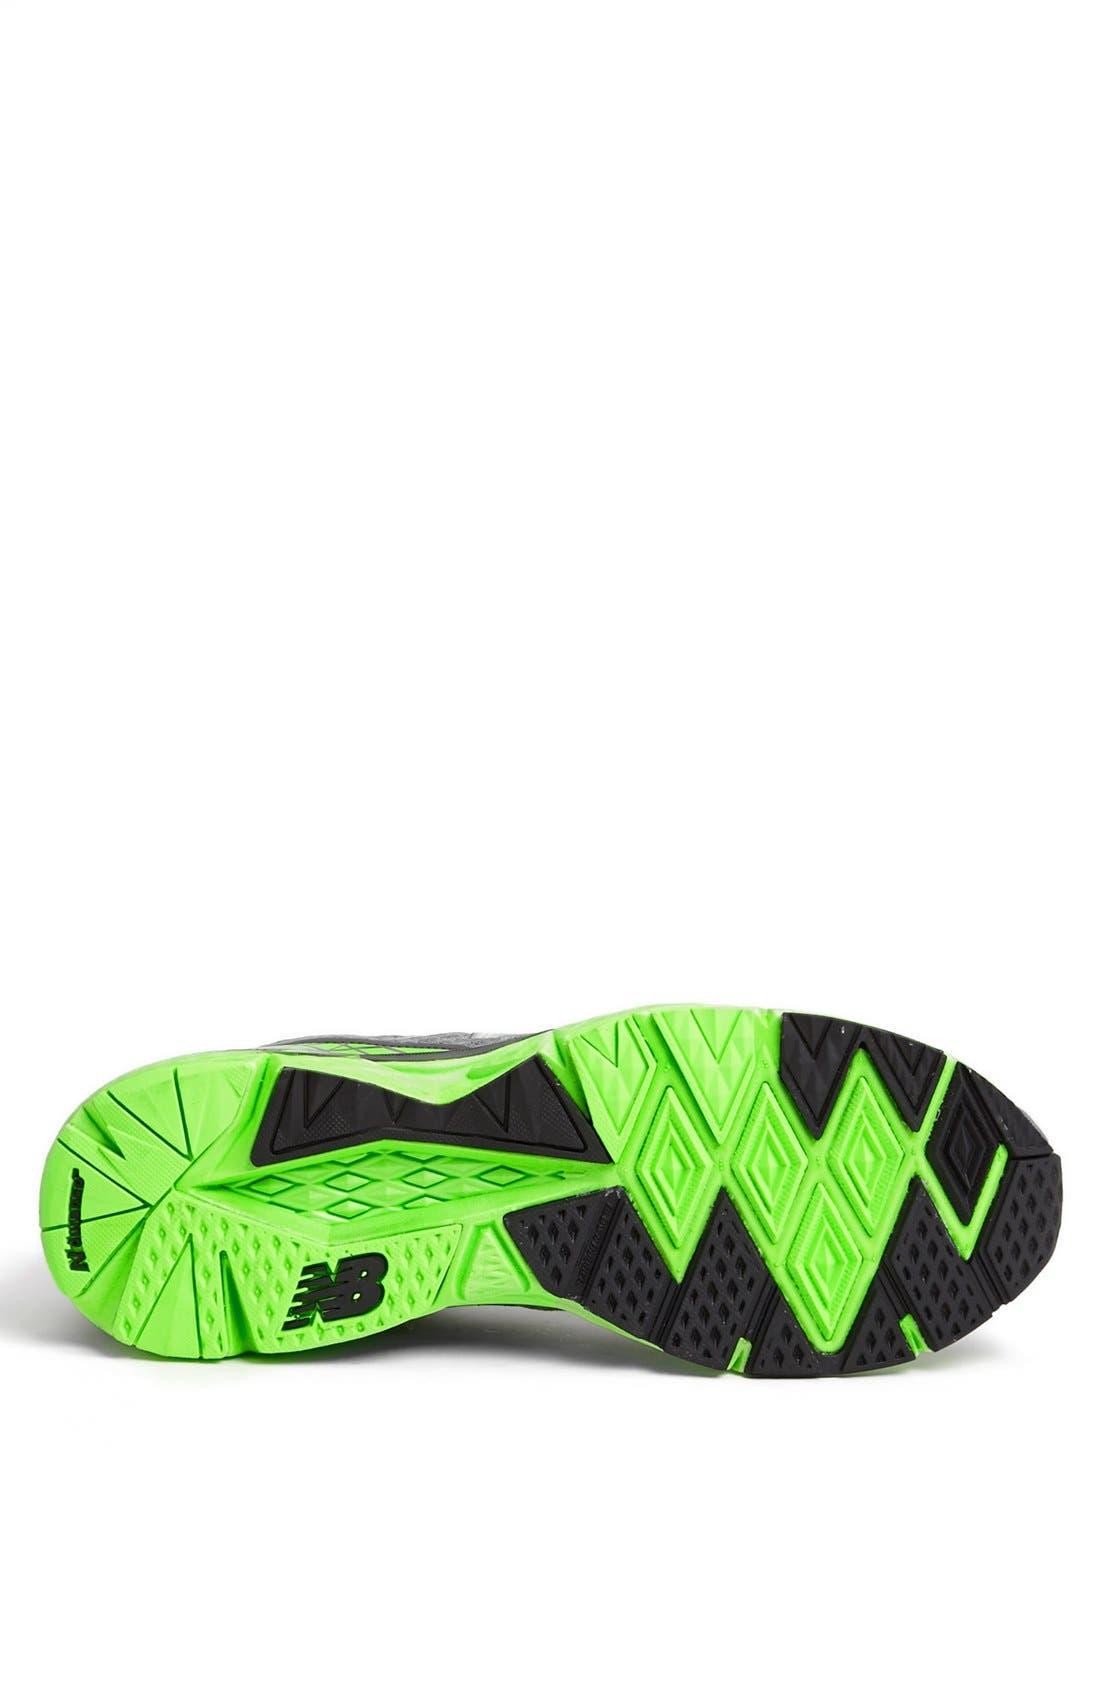 Alternate Image 4  - New Balance '790' Running Shoe (Men) (Online Only Color)